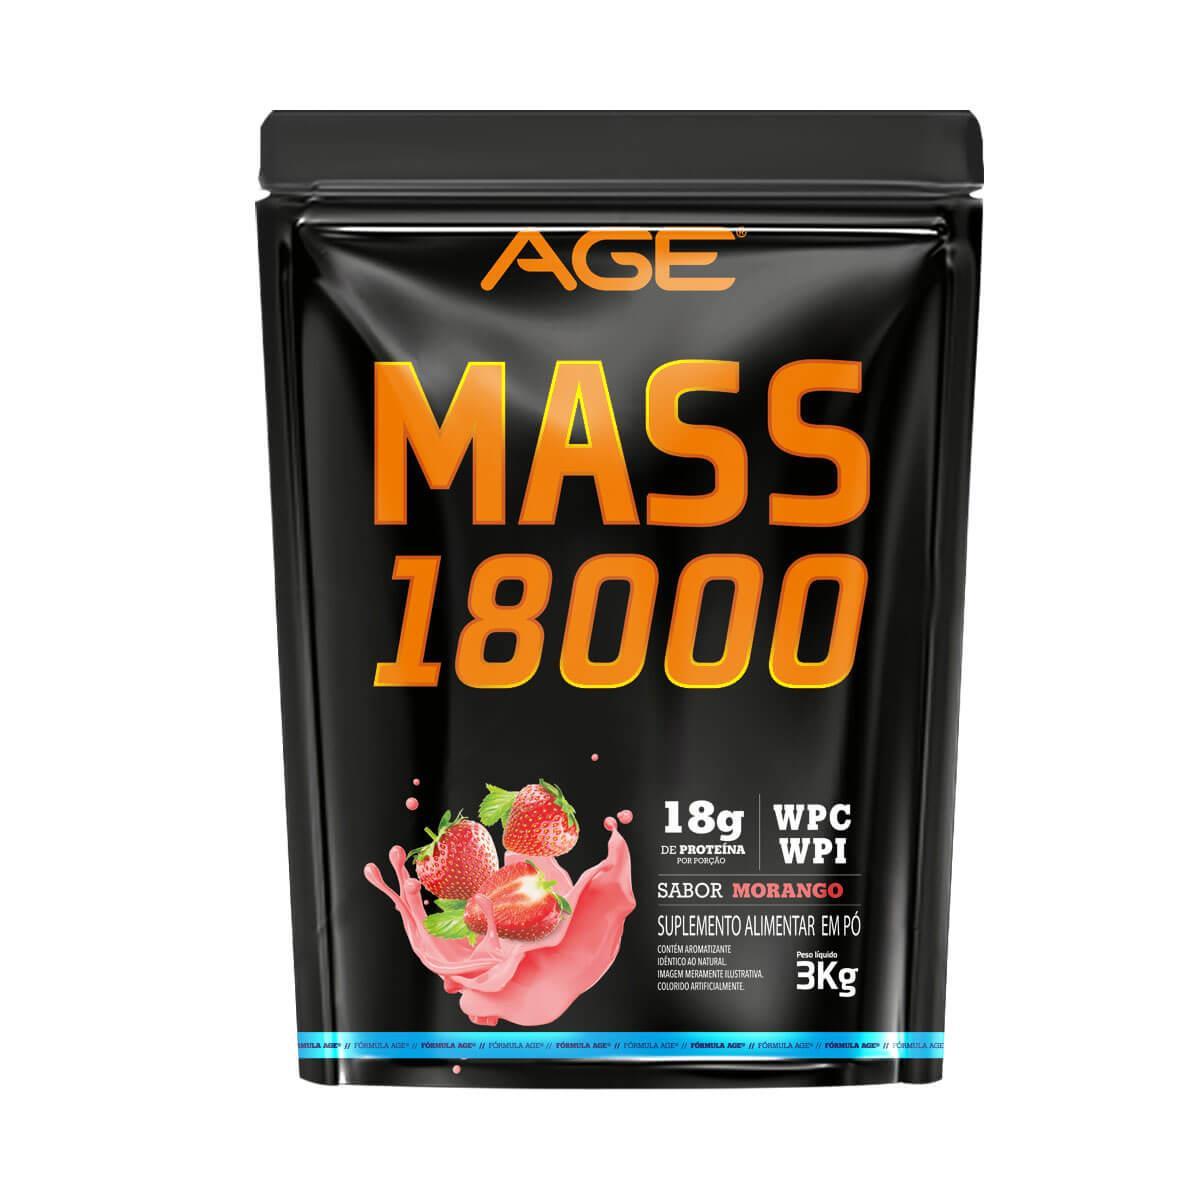 MASS 18000 (3Kg) - Morango - AGE